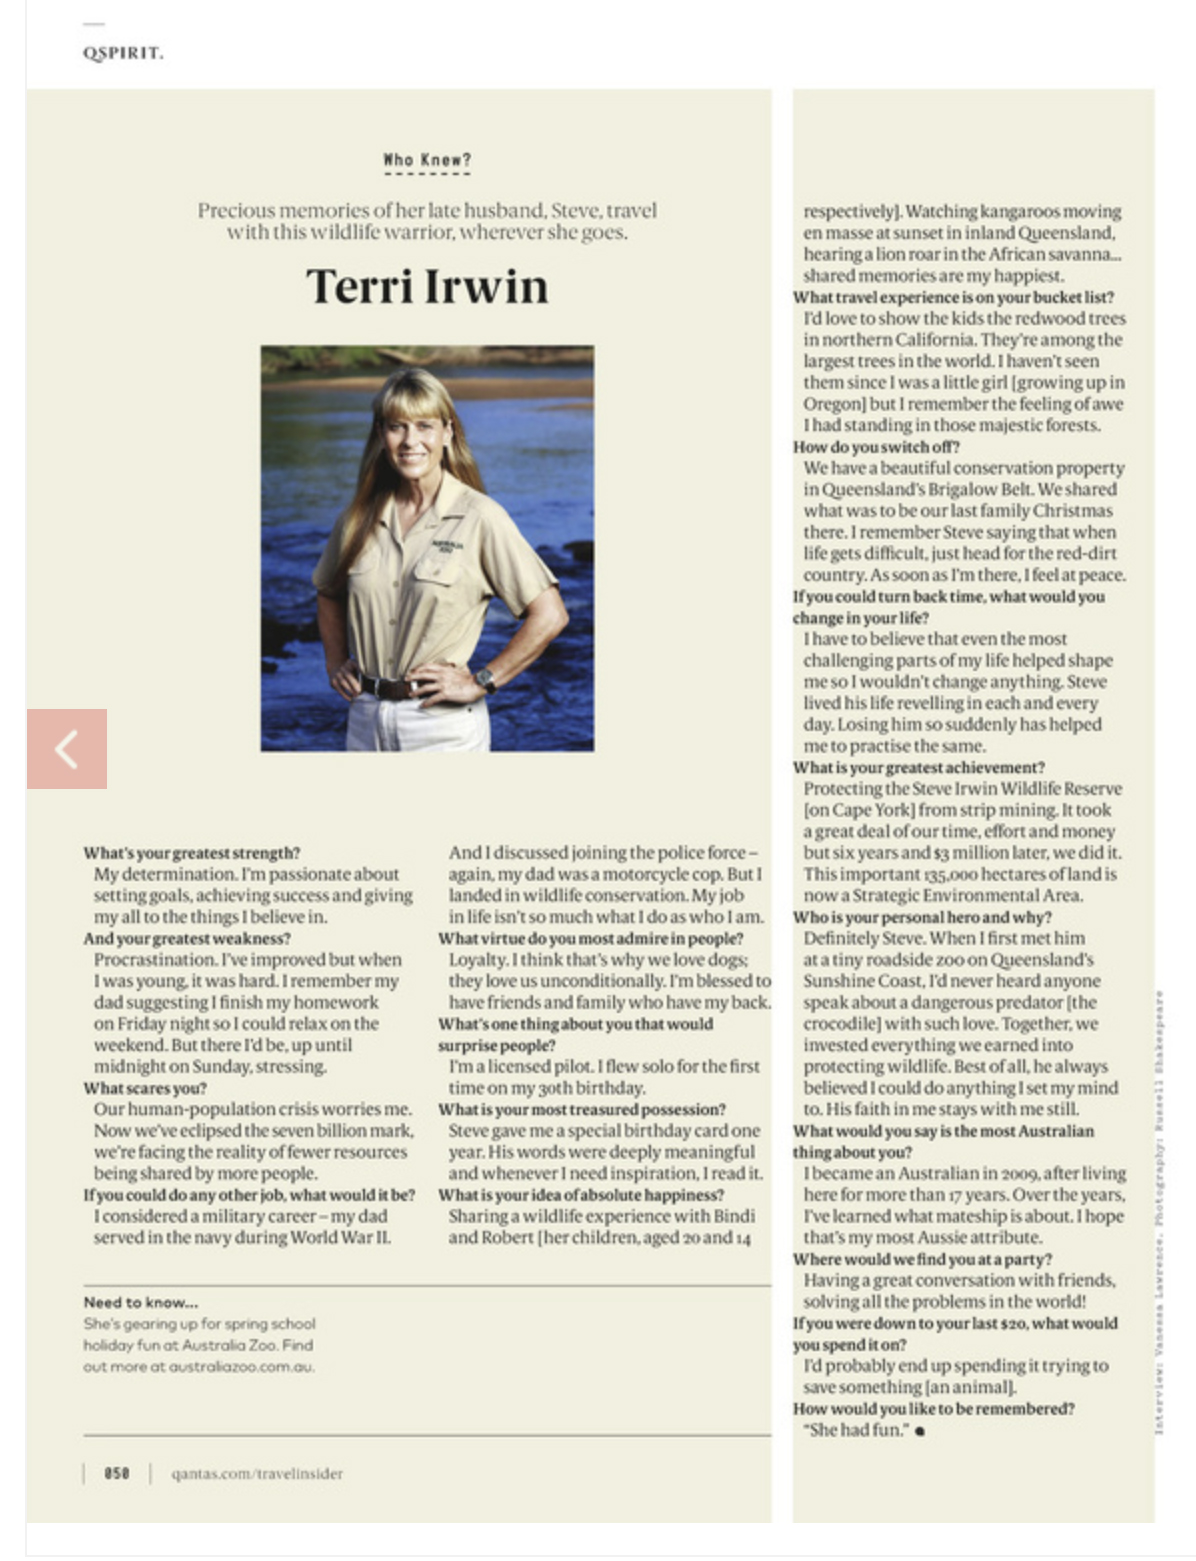 Terri Irwin photographed at The Steve Irwin Wildlife Reserve for Qantas Magazine